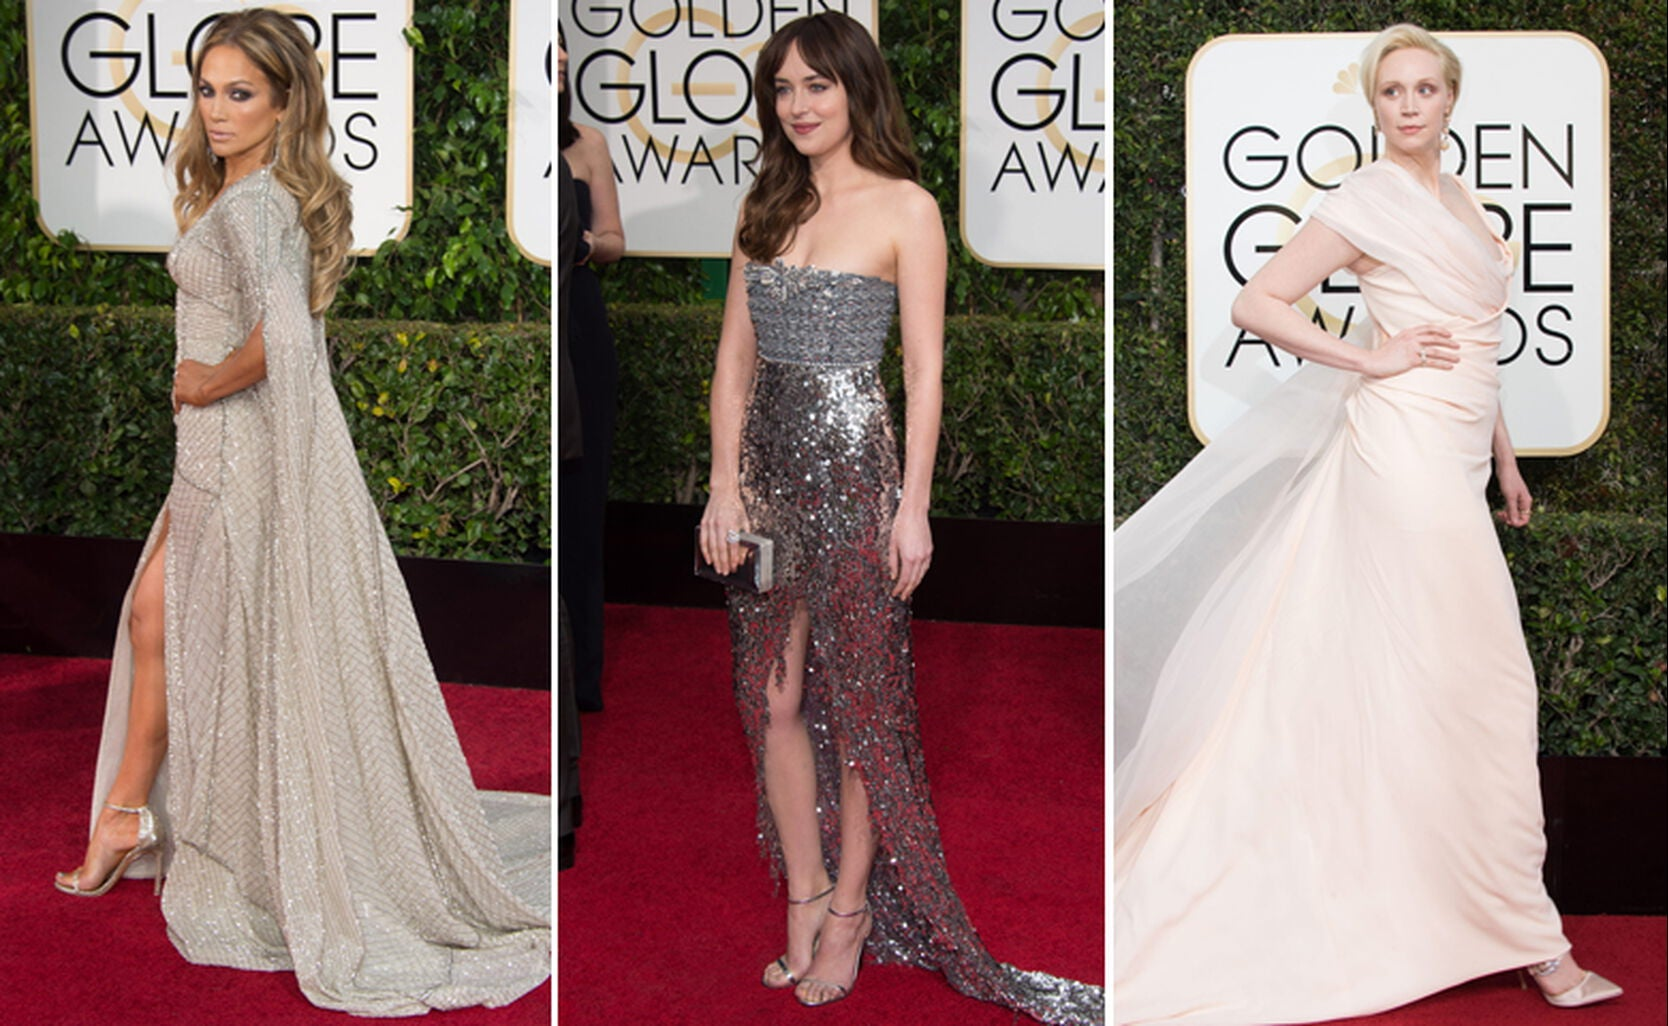 Jennifer Lopez, Dakota Johnson and Gwendoline Christie